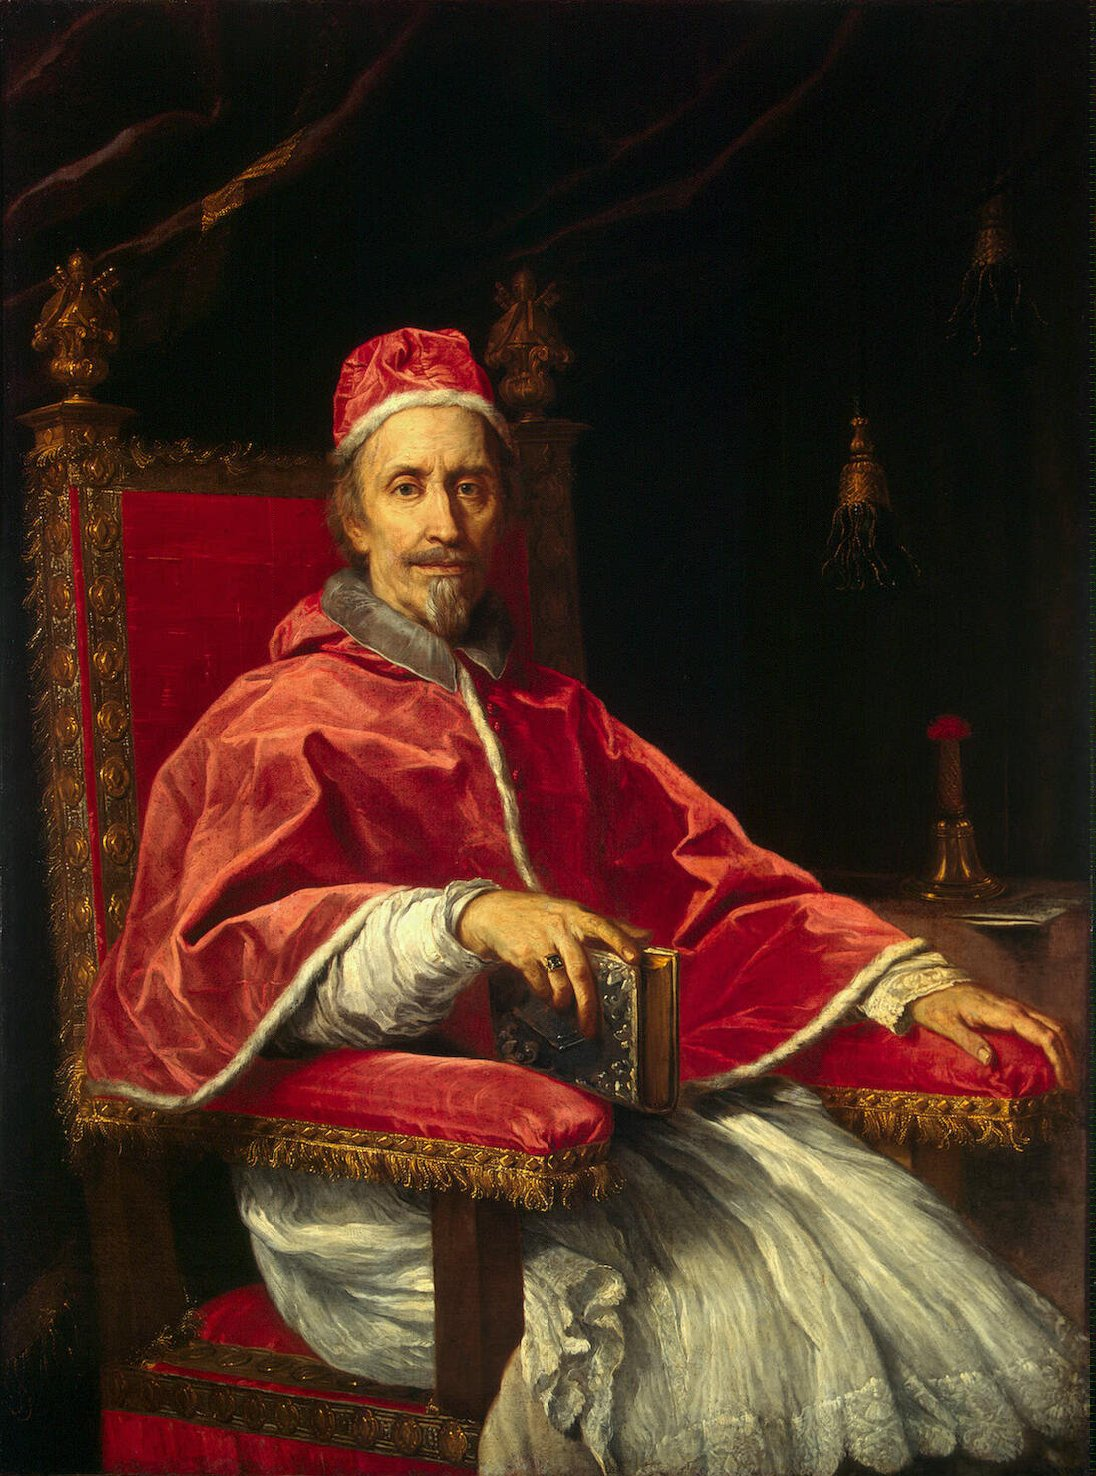 http://upload.wikimedia.org/wikipedia/commons/4/40/Pope_Clement_IX.jpg